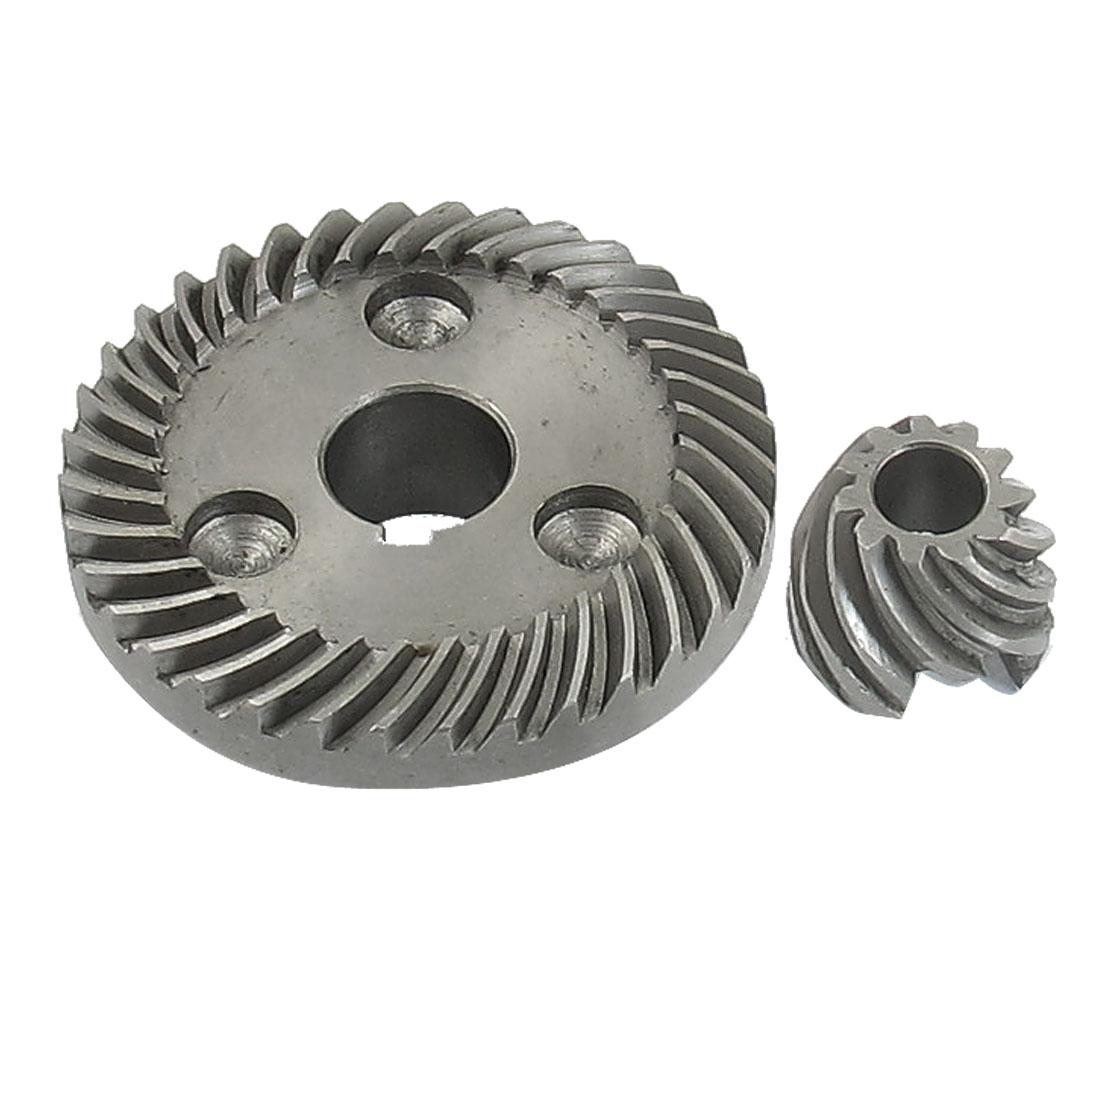 2 Pcs 12mm Shaft Metal Spiral Bevel Gear Set for Makita 9523NB